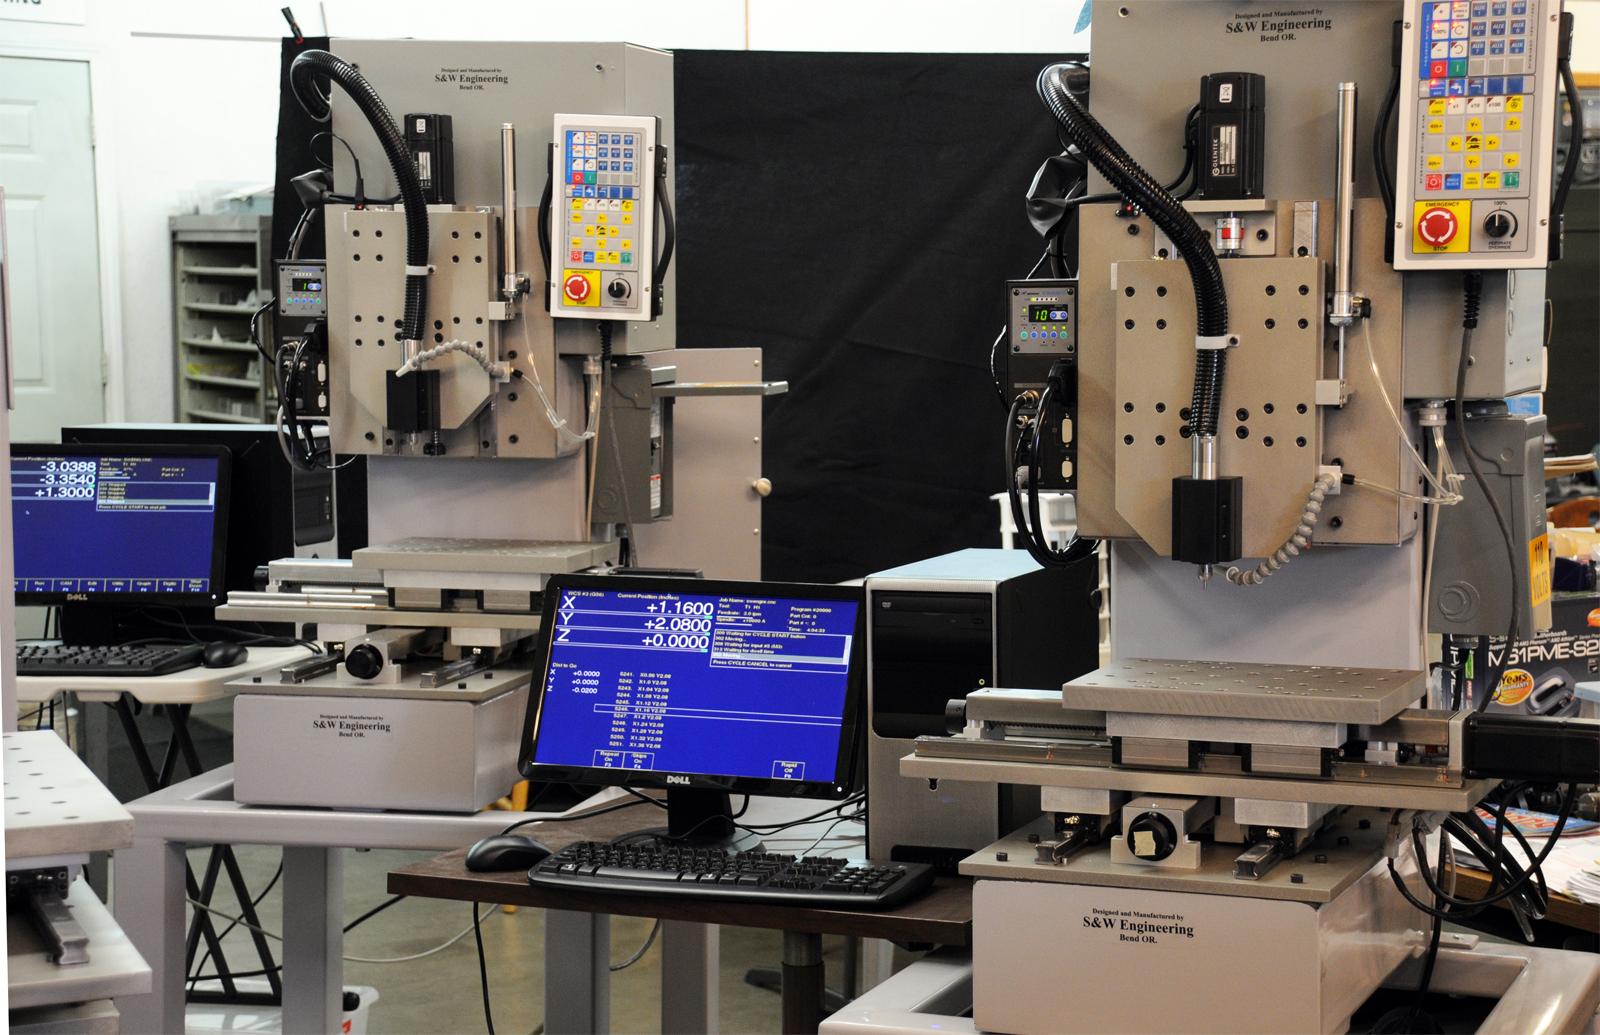 Micro Cnc Machining Ultrasonic Cnc Cutting And Welding